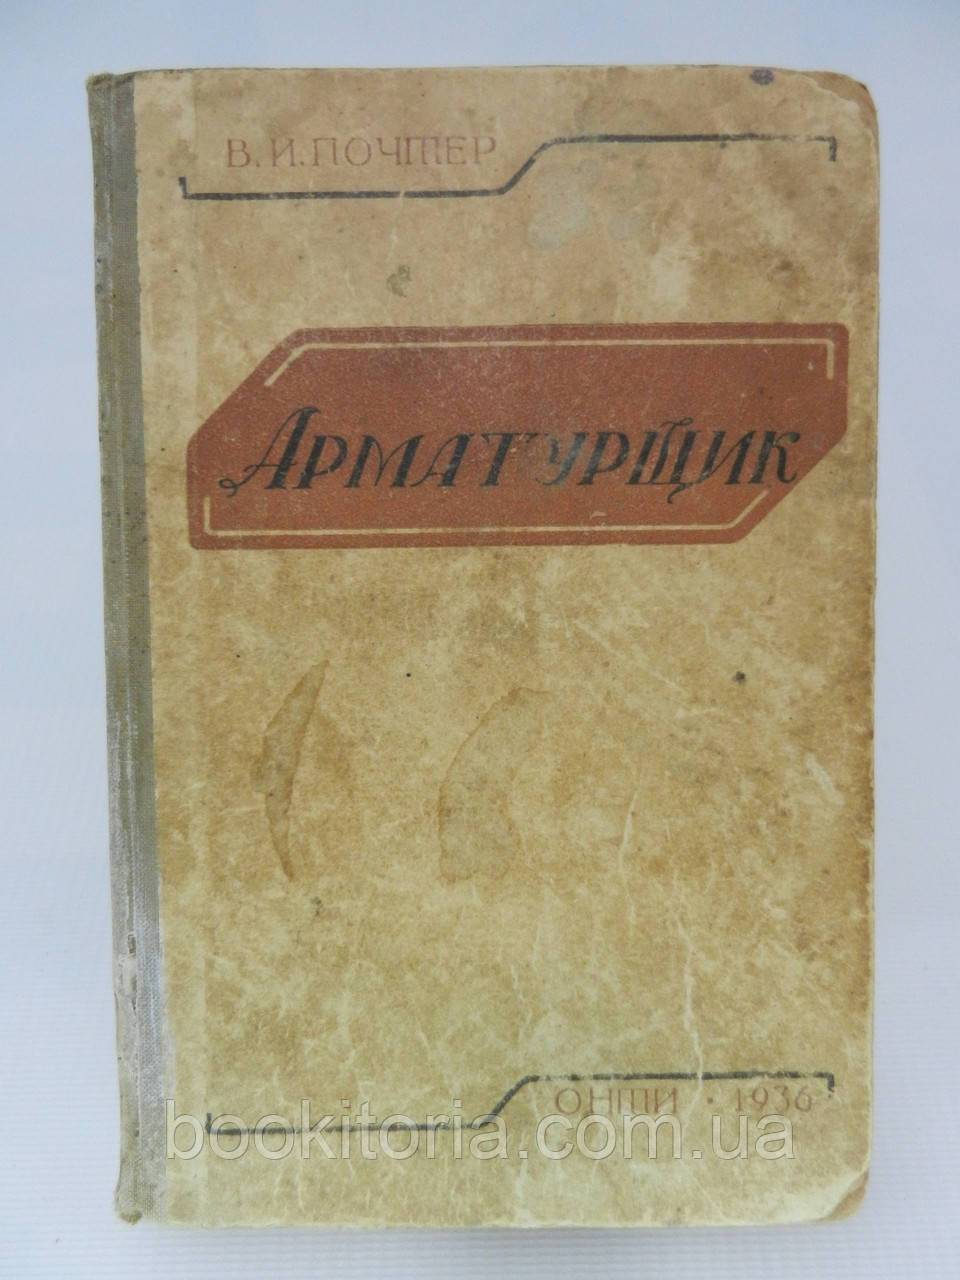 Почтер В.И. Арматурщик (б/у).